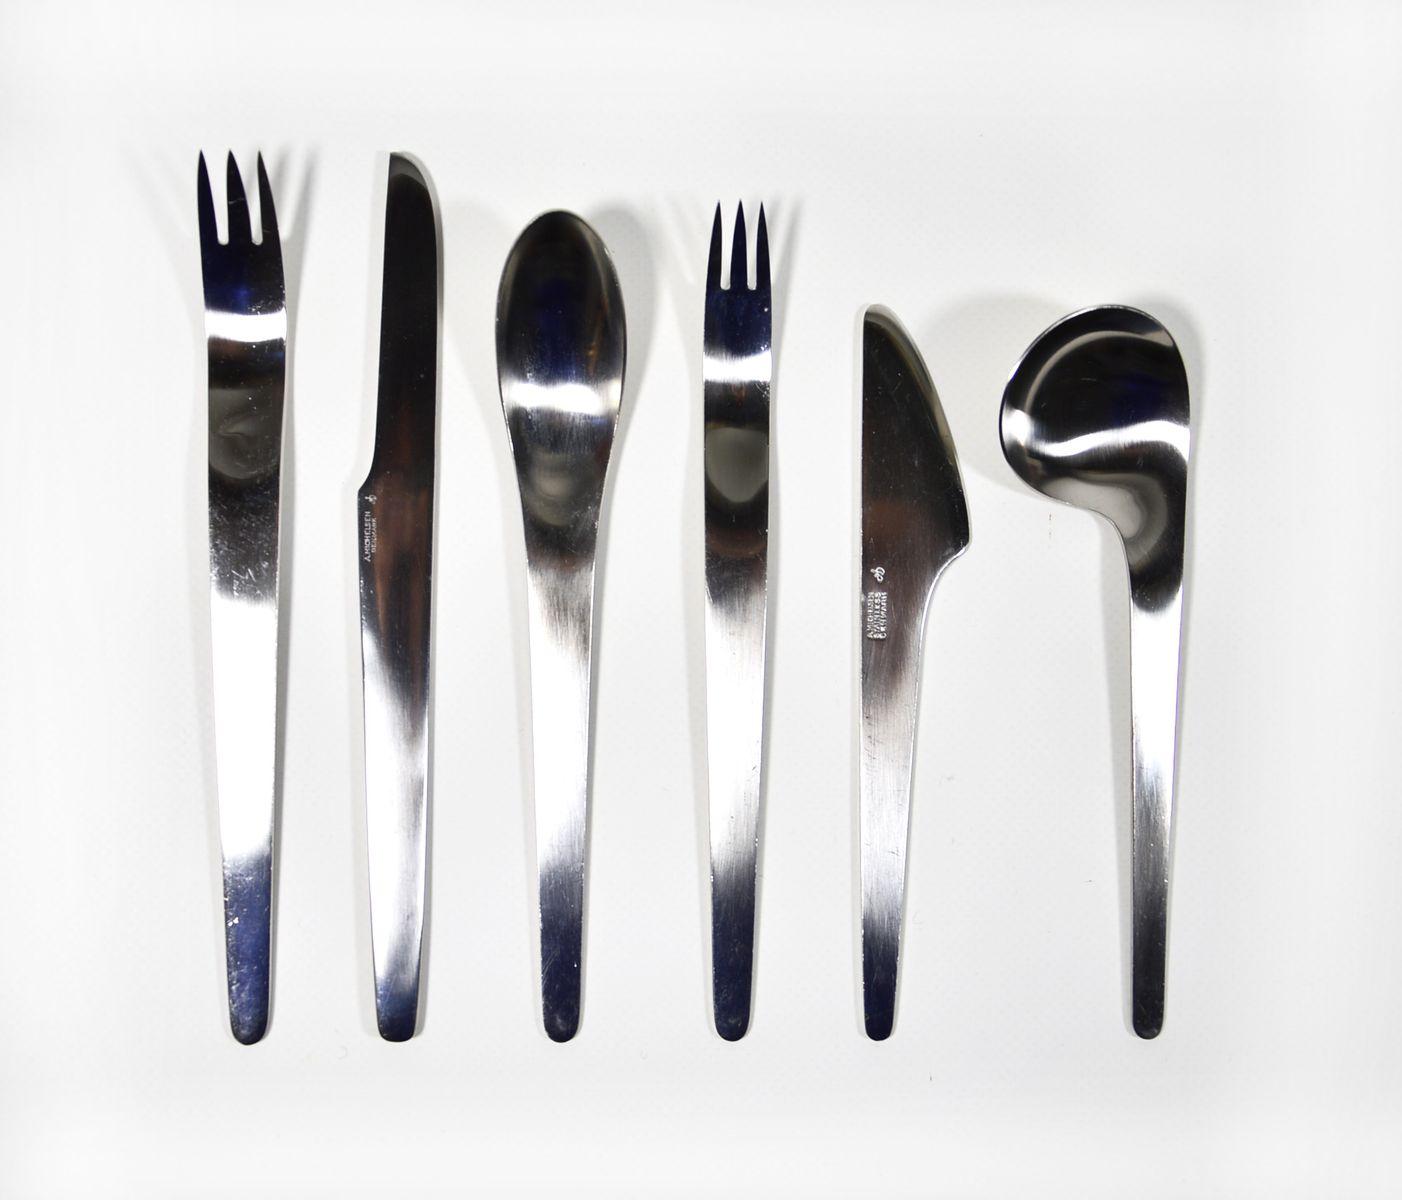 Mid century model 660 aj flatware cutlery set by arne jacobsen for anton michelsen for sale at - Arne jacobsen flatware ...